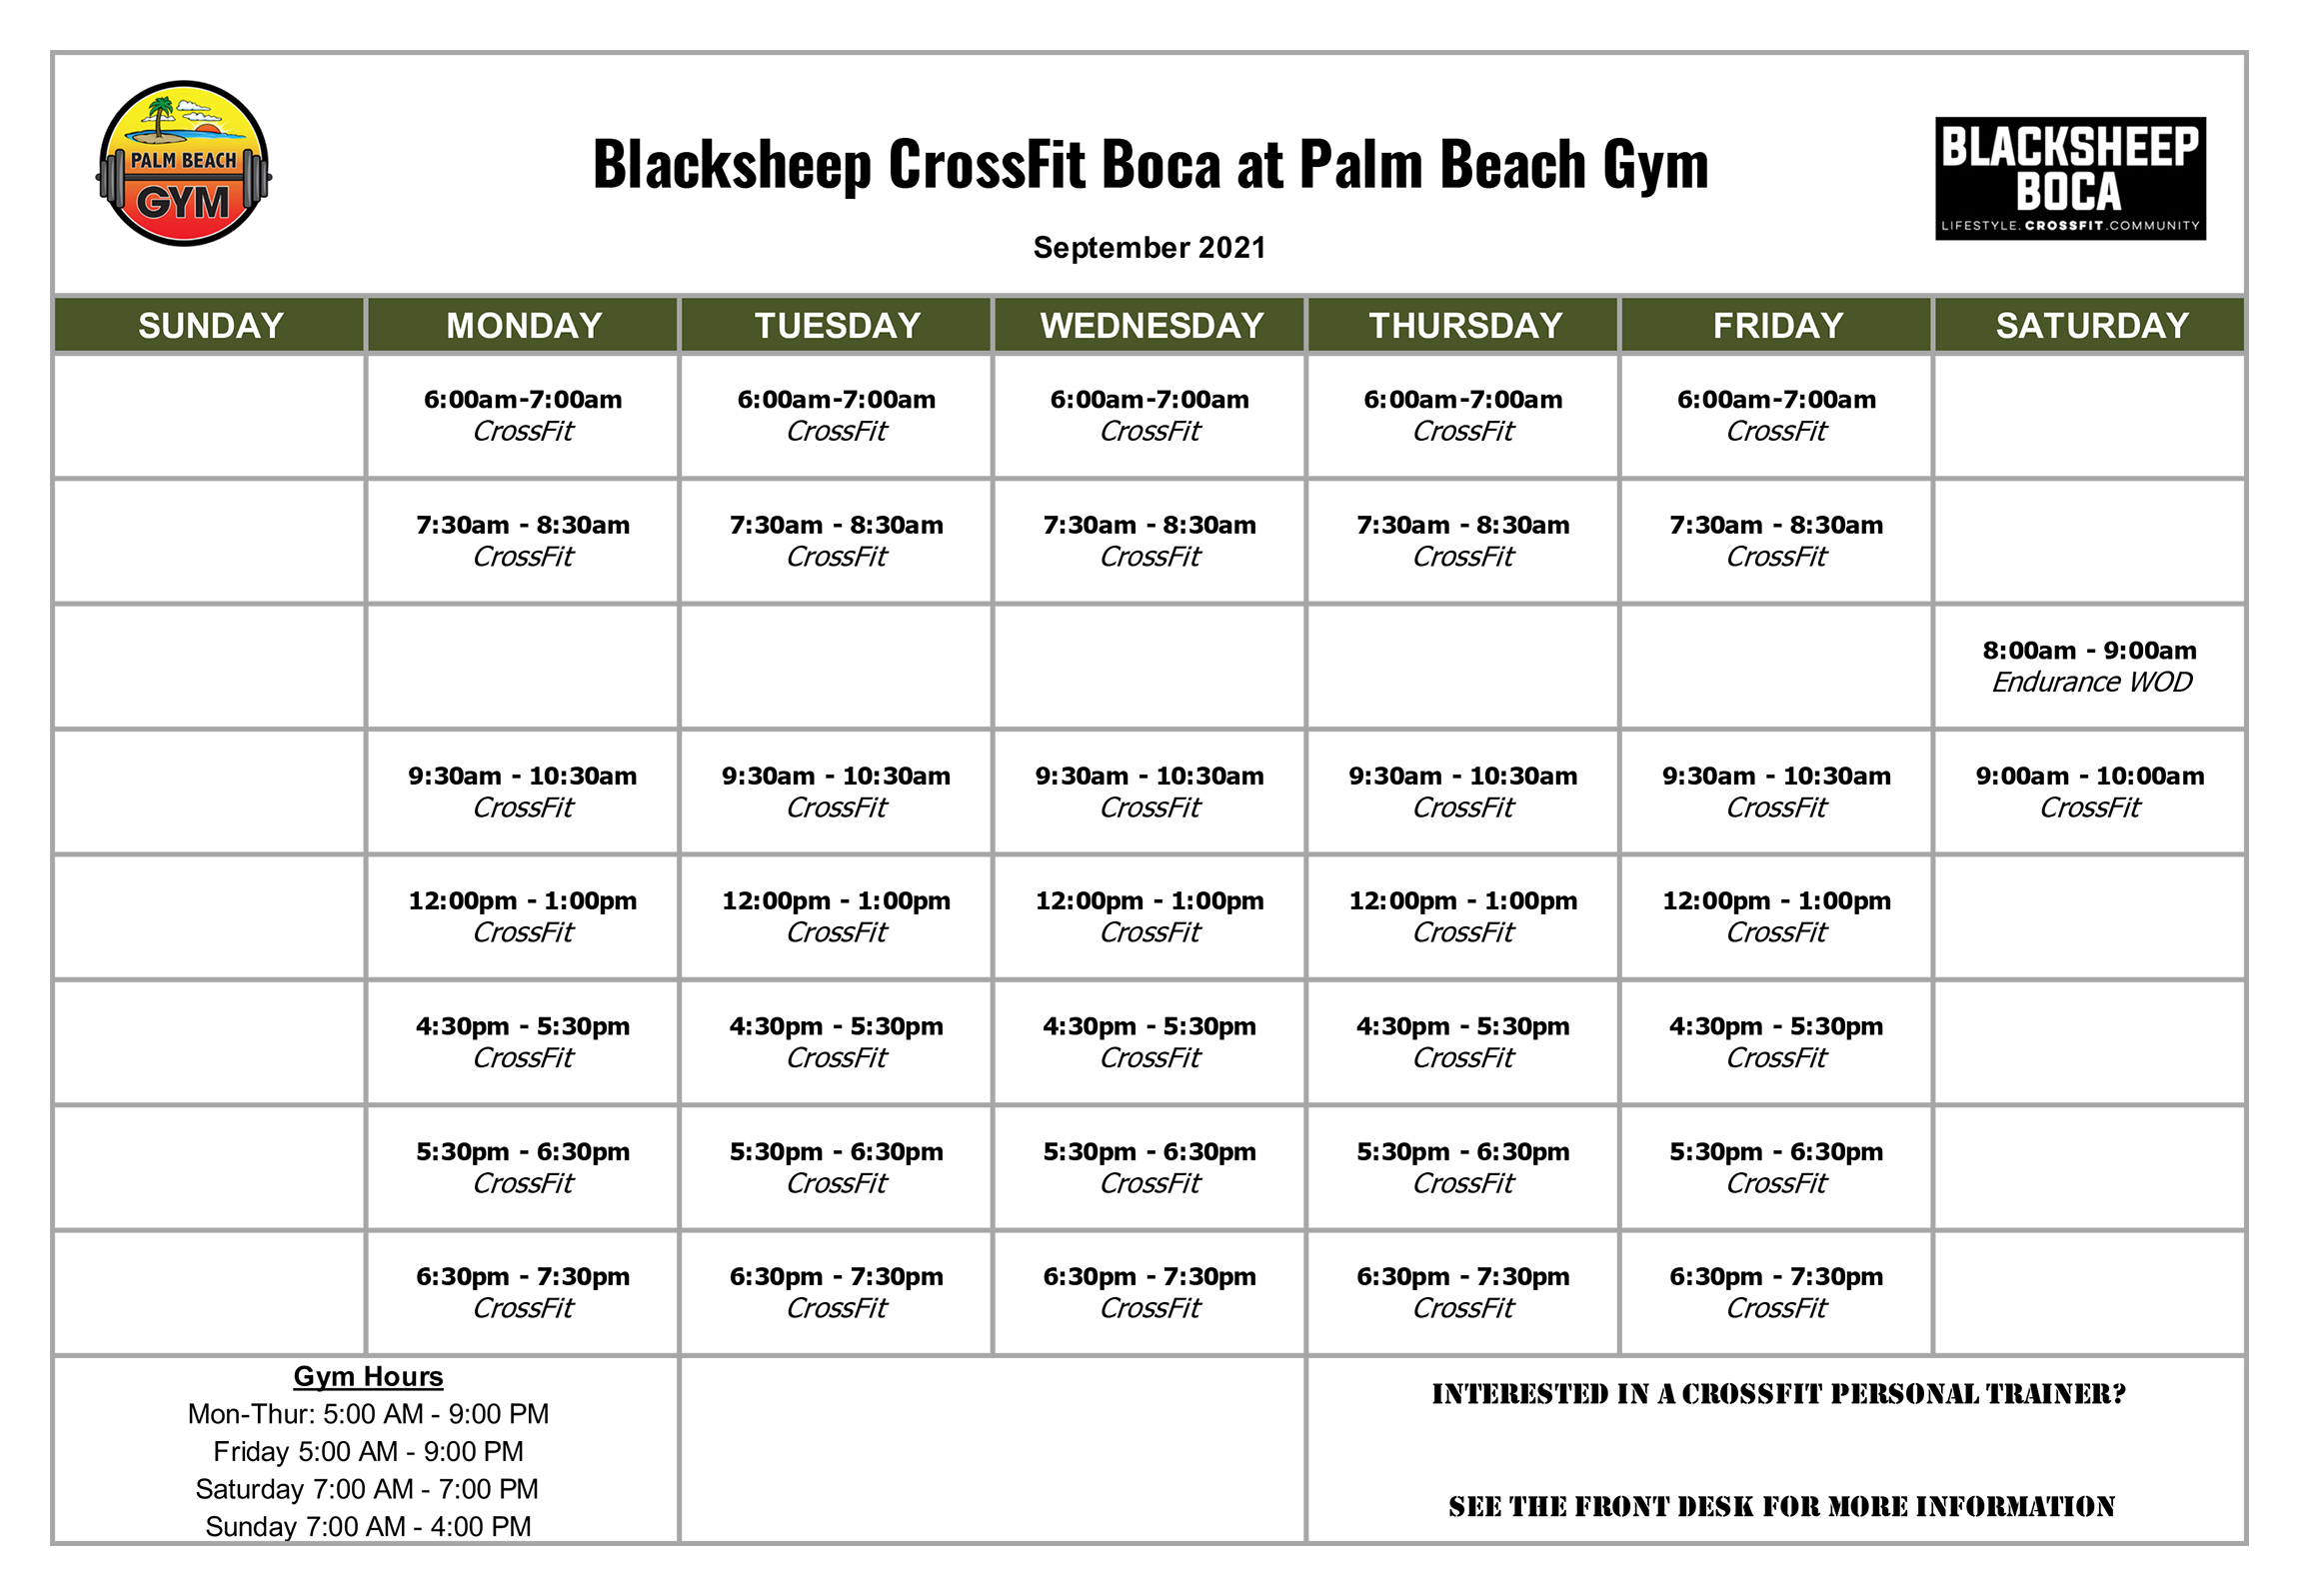 Blacksheep Boca Raton CrossFit Class Schedule